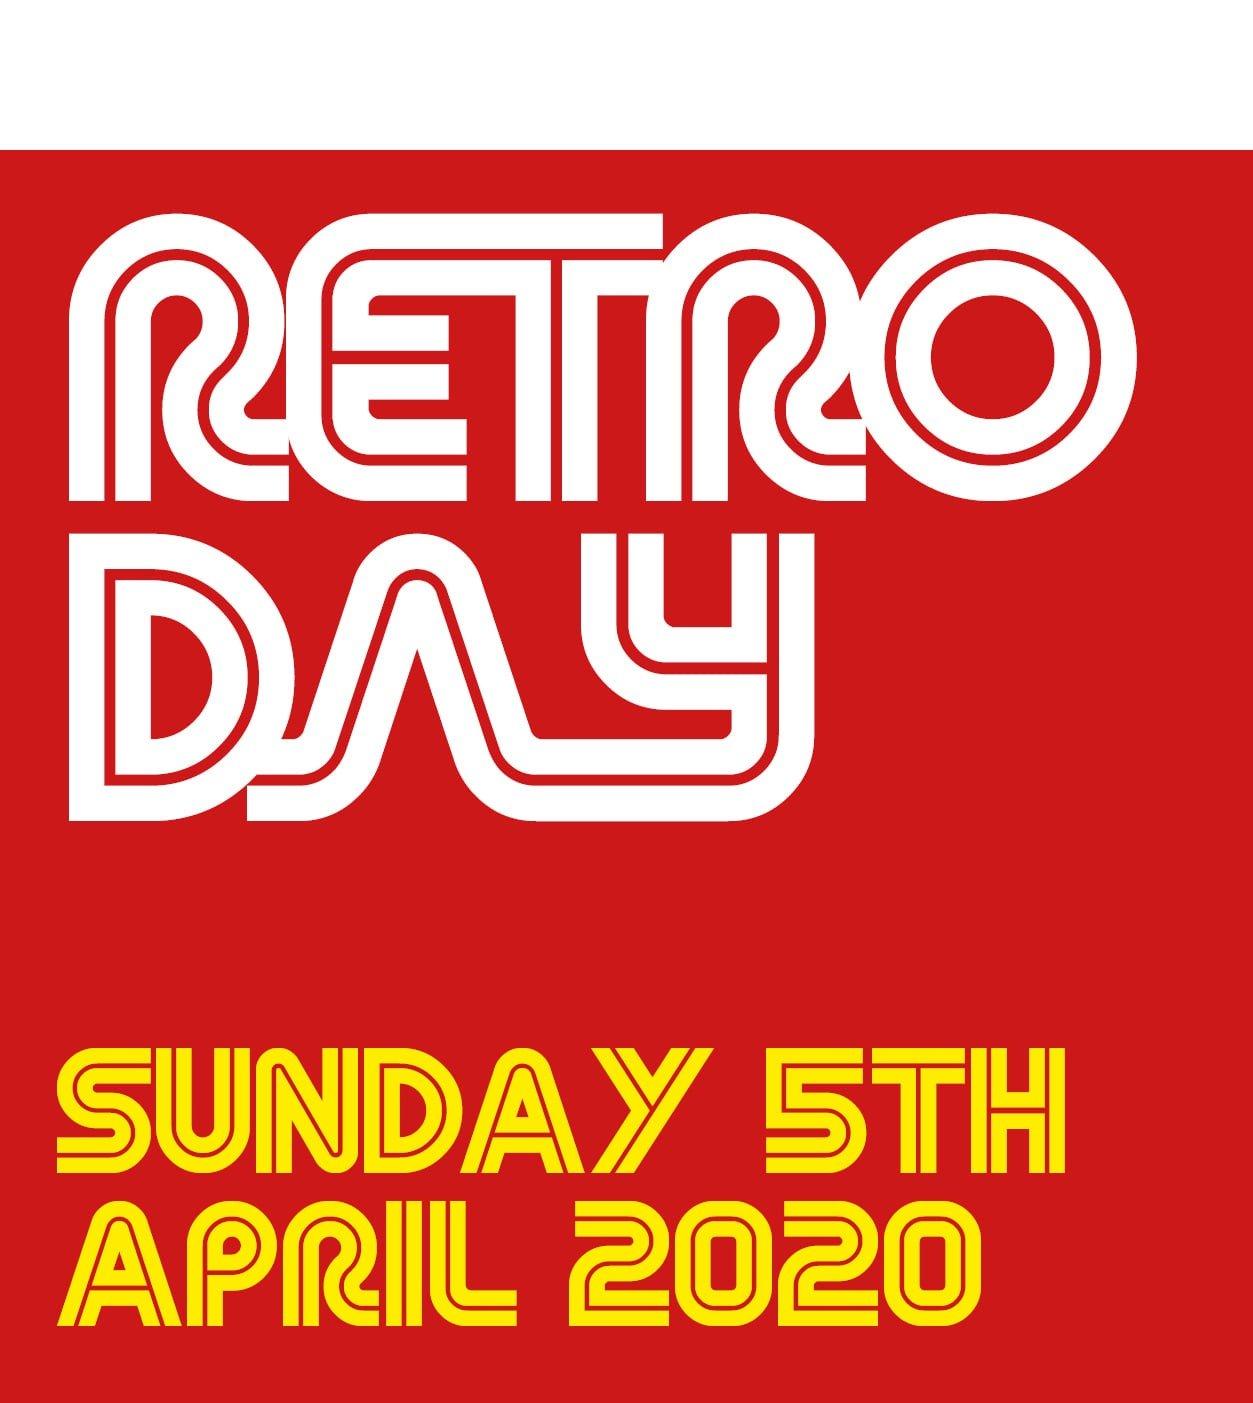 **POSTPONED** - Retro Toyota Day 2020